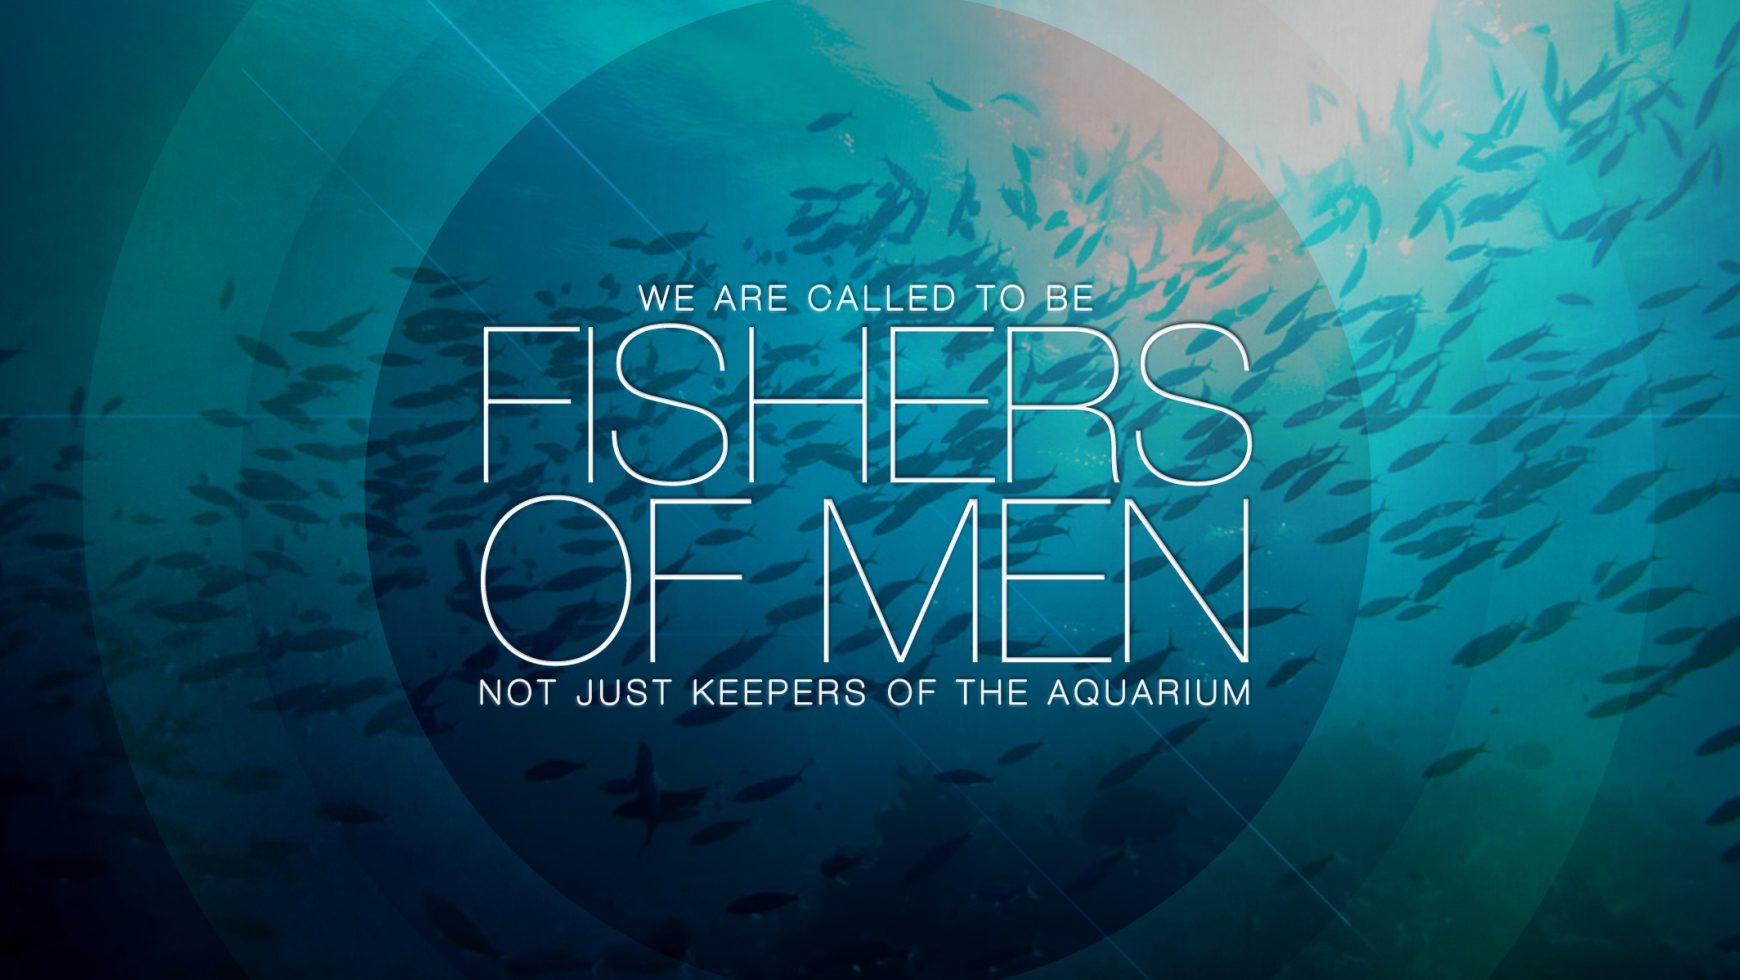 Correcting the Dysfunctions of Aquarium Churches